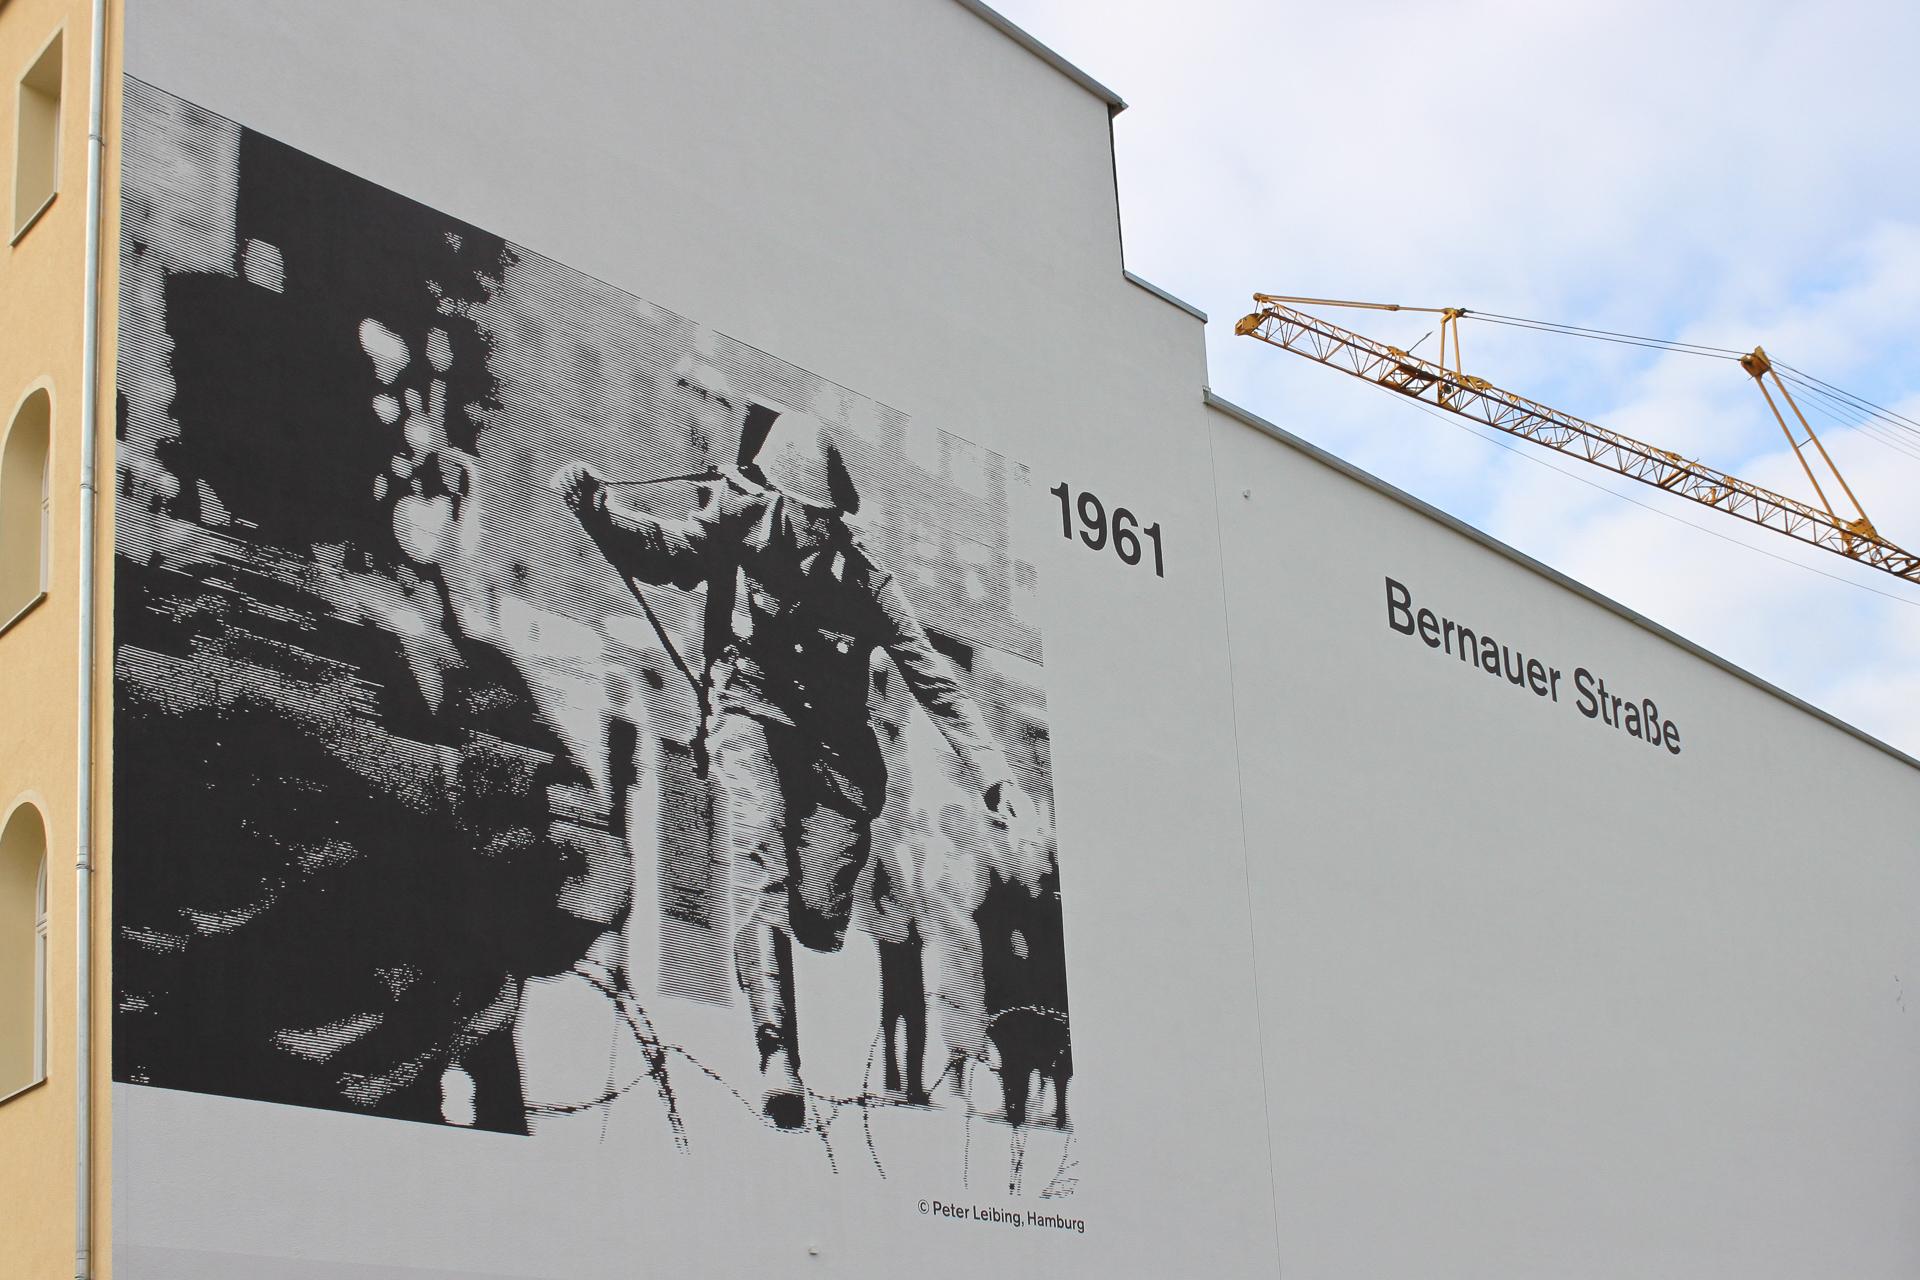 Wall Murals, Berlin Wall Memorial